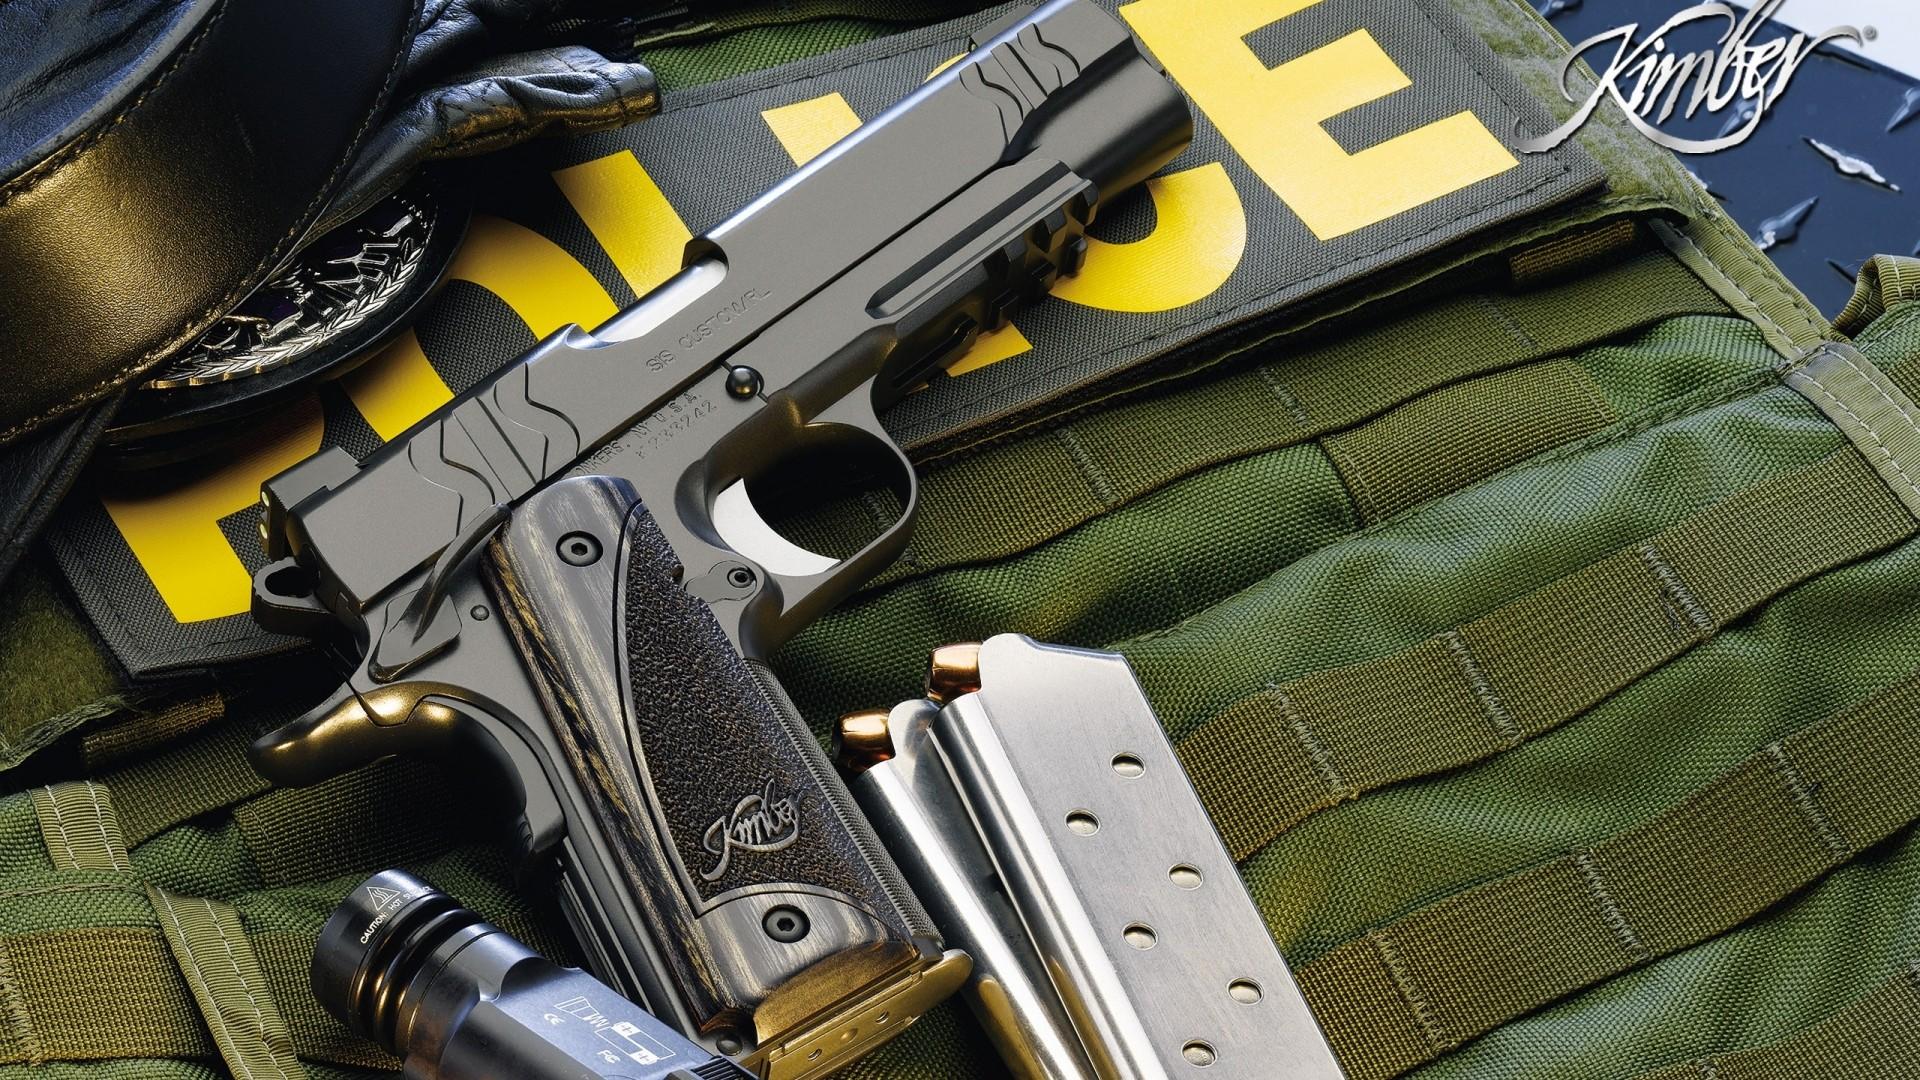 … police; police, guns, gun